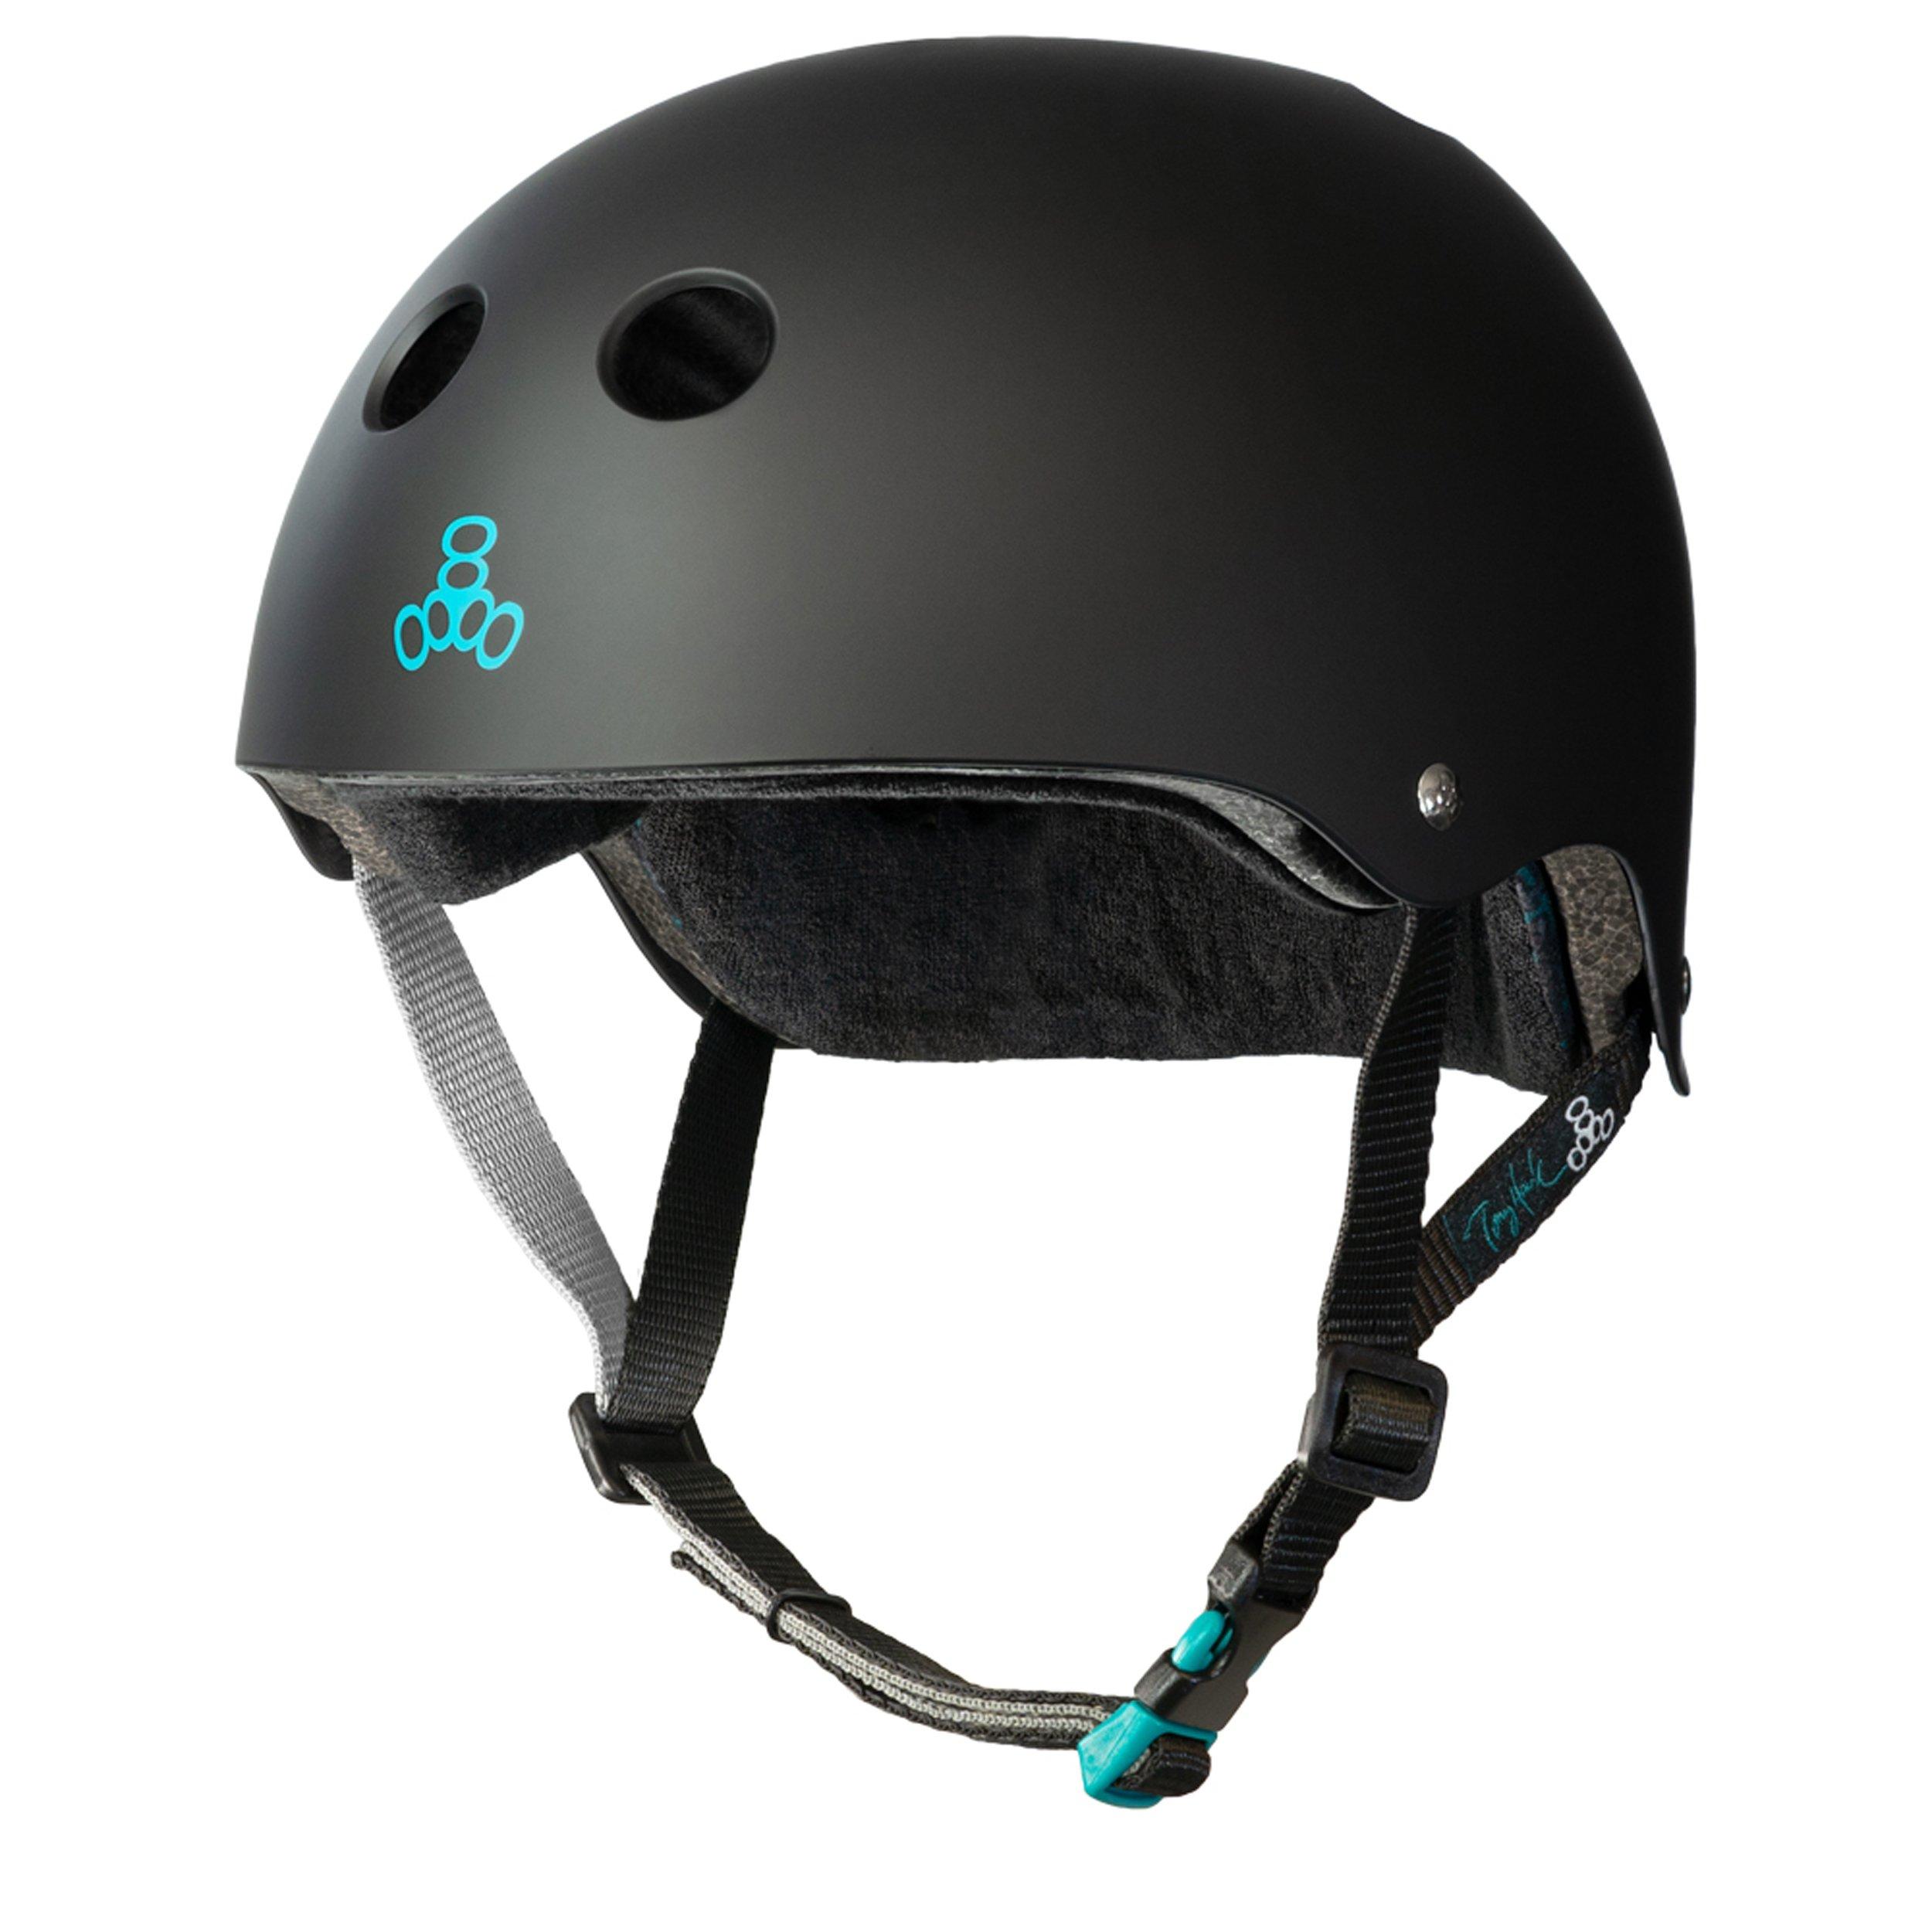 Triple Eight Tony Hawk Signature Model The Certified Sweatsaver Helmet for Skateboarding, BMX, and Roller Skating, Large/X-Large by Triple Eight